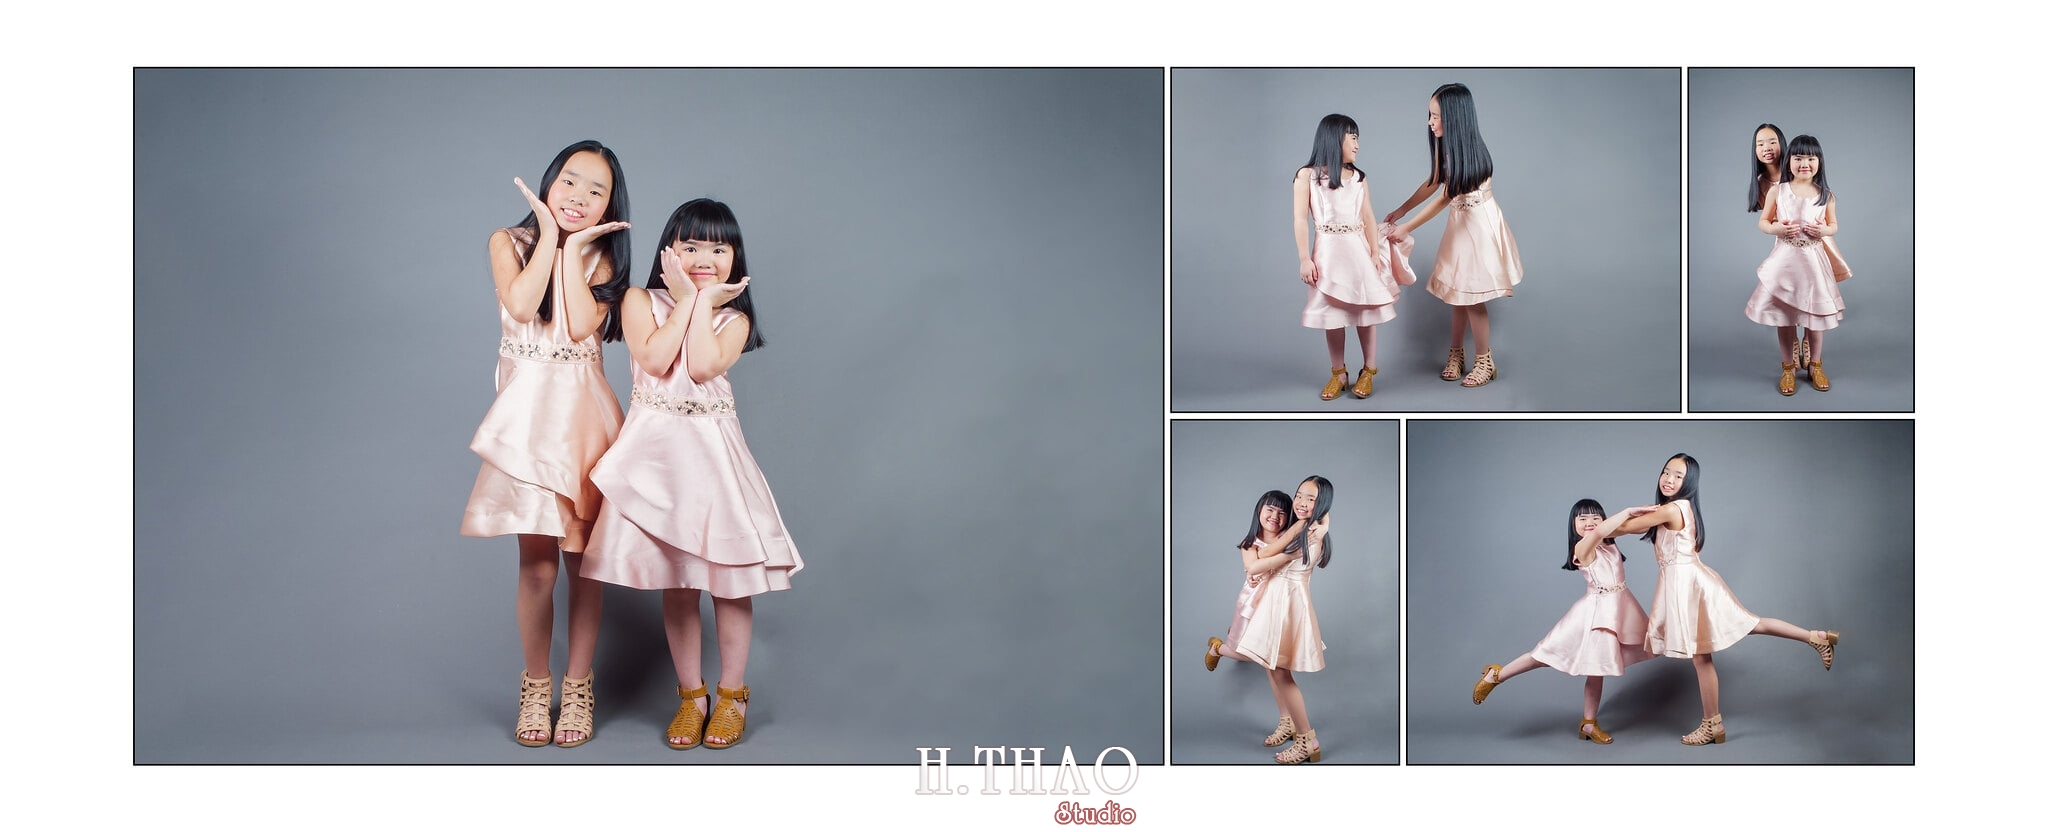 Anh gia dinh Jenny Nguyen 6 - Album ảnh gia đình chị Jenny Nguyễn - HThao Studio